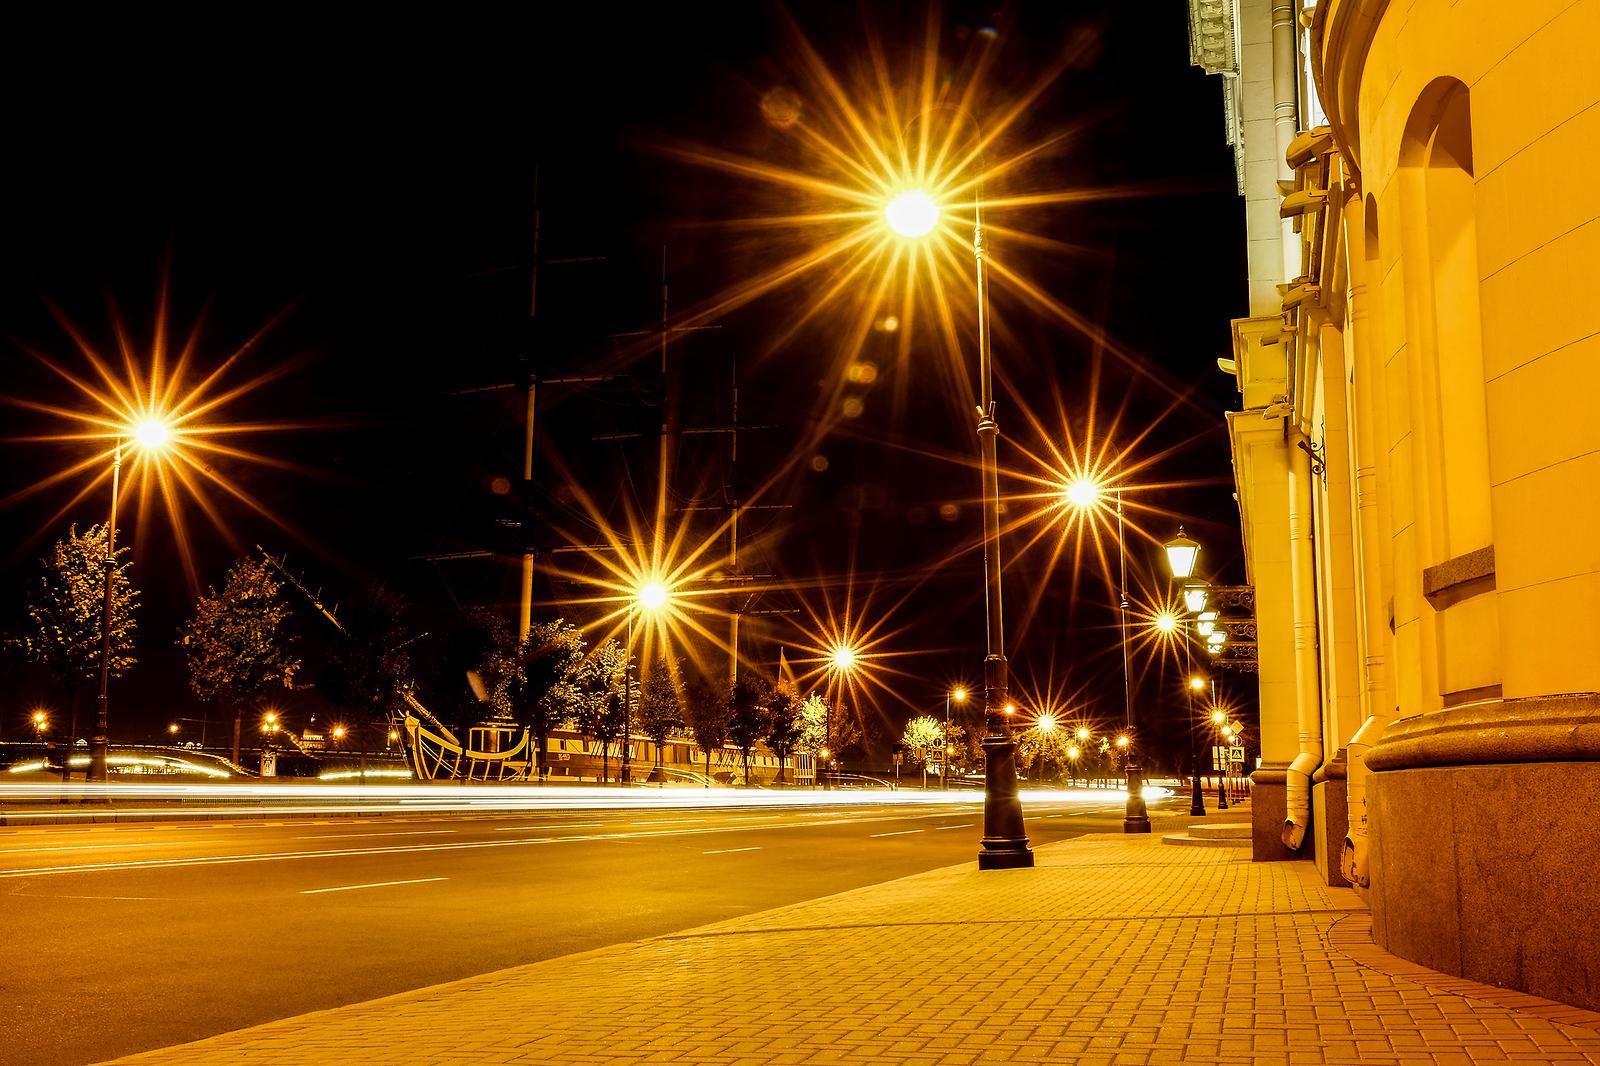 Night City Street Lights, Bokeh, Background, Darkness. Night Lig